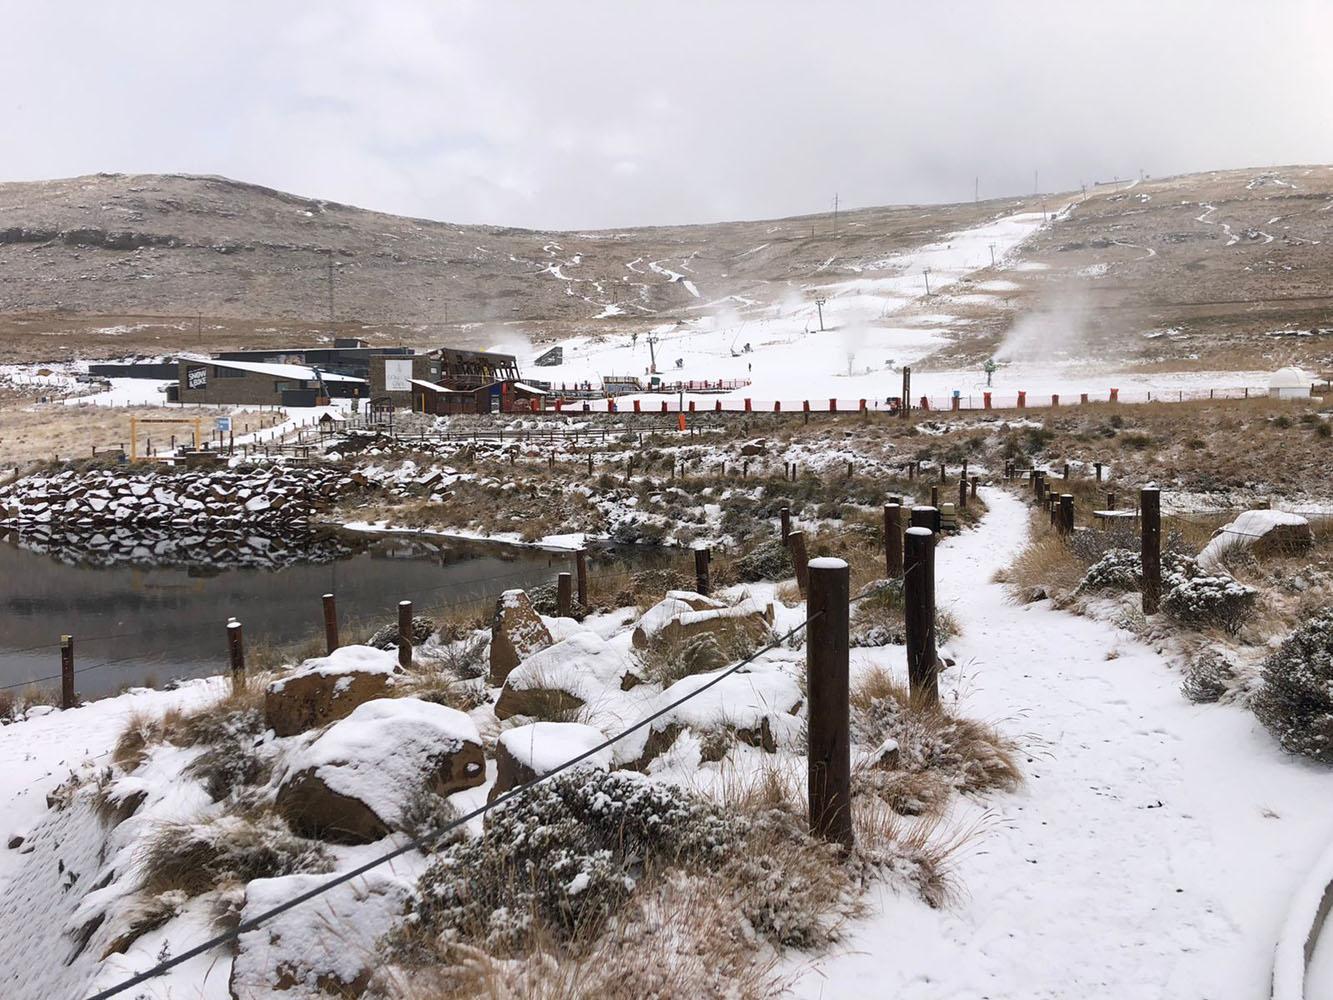 Snow at Afriski Mountain resort